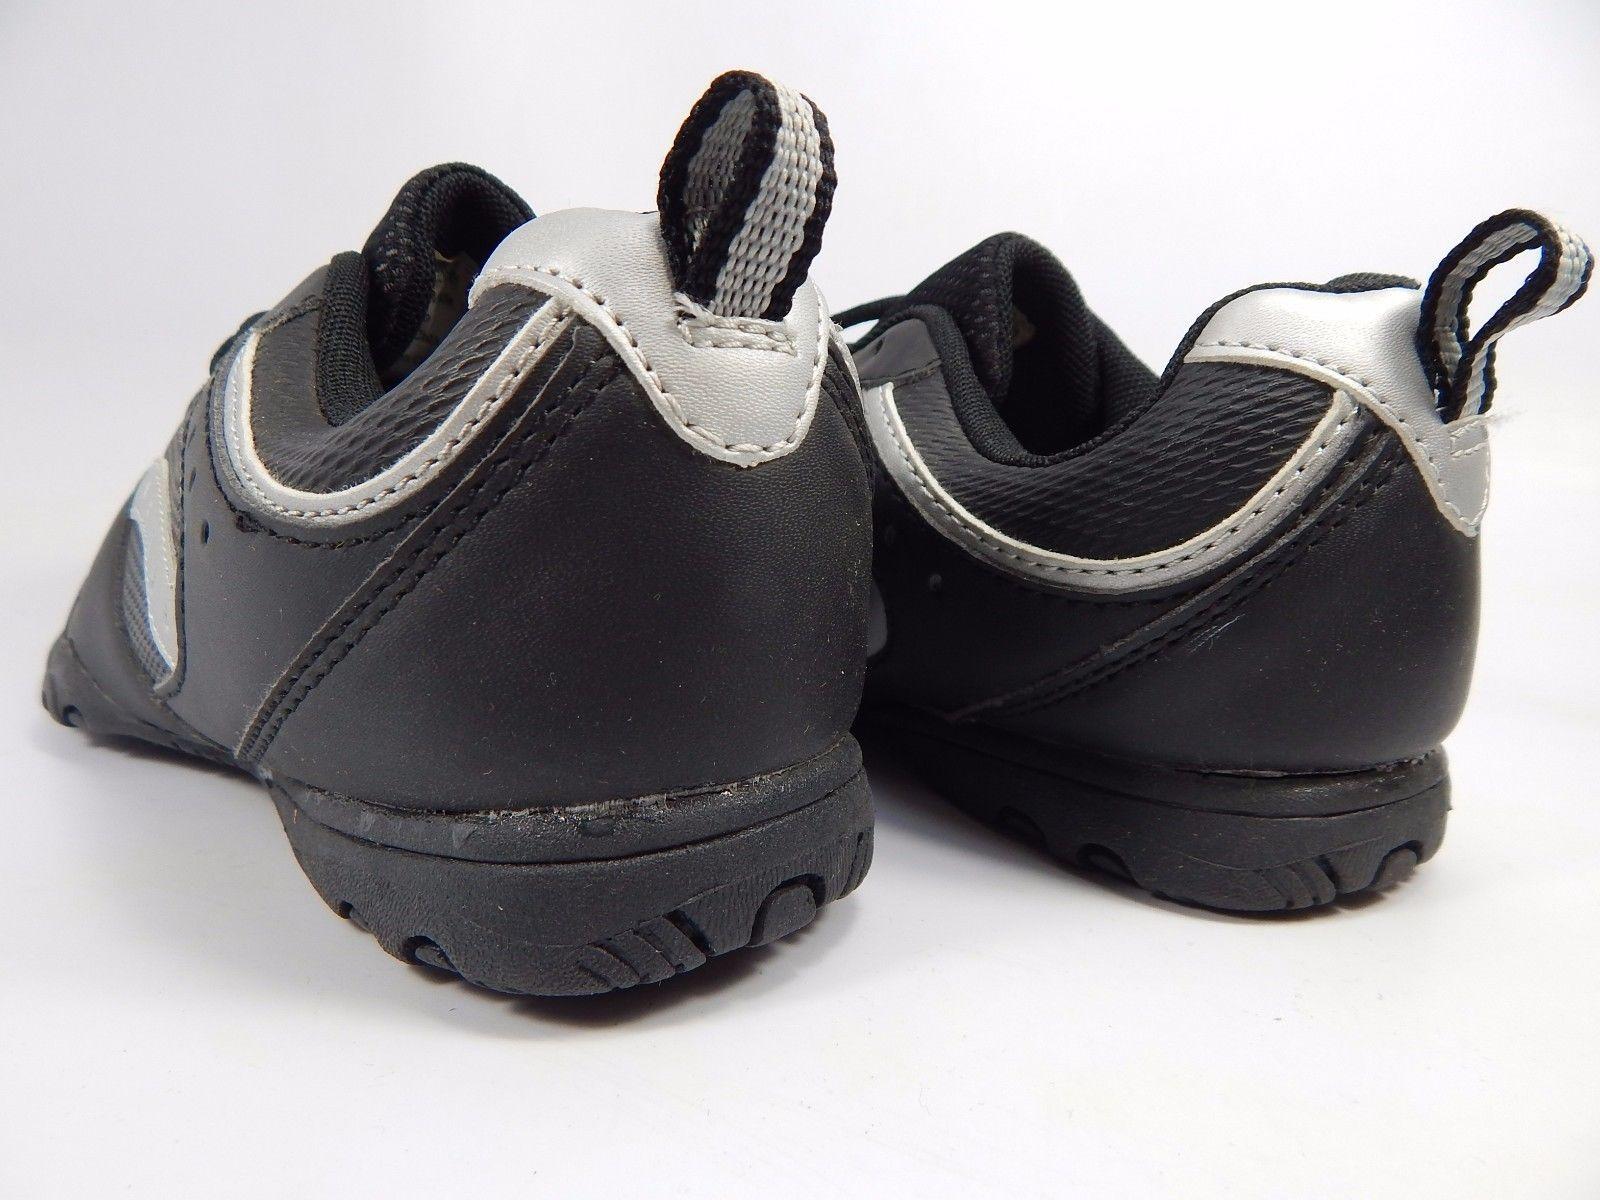 Women's Athletic Running Shoes Sz US 6.5 M (B) EU 37.5 Black Silver wmub0300001